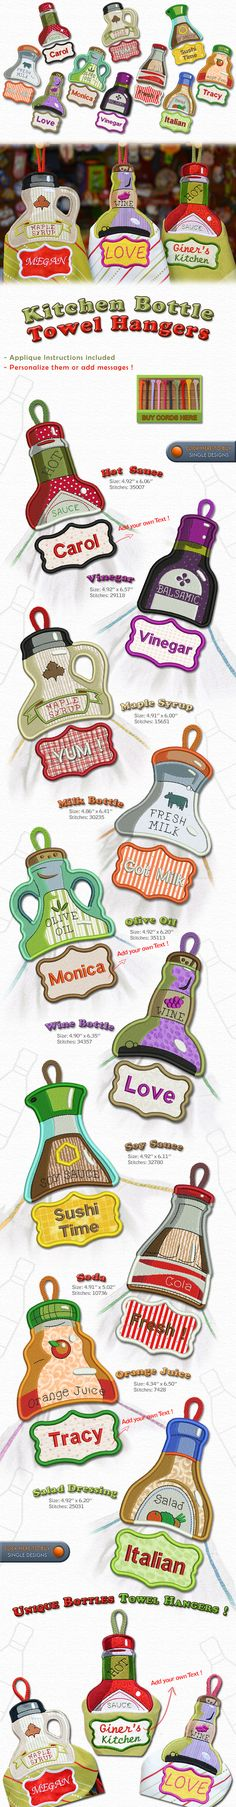 KITCHEN BOTTLES TOWEL HANGER Embroidery Designs Free Embroidery Design Patterns Applique